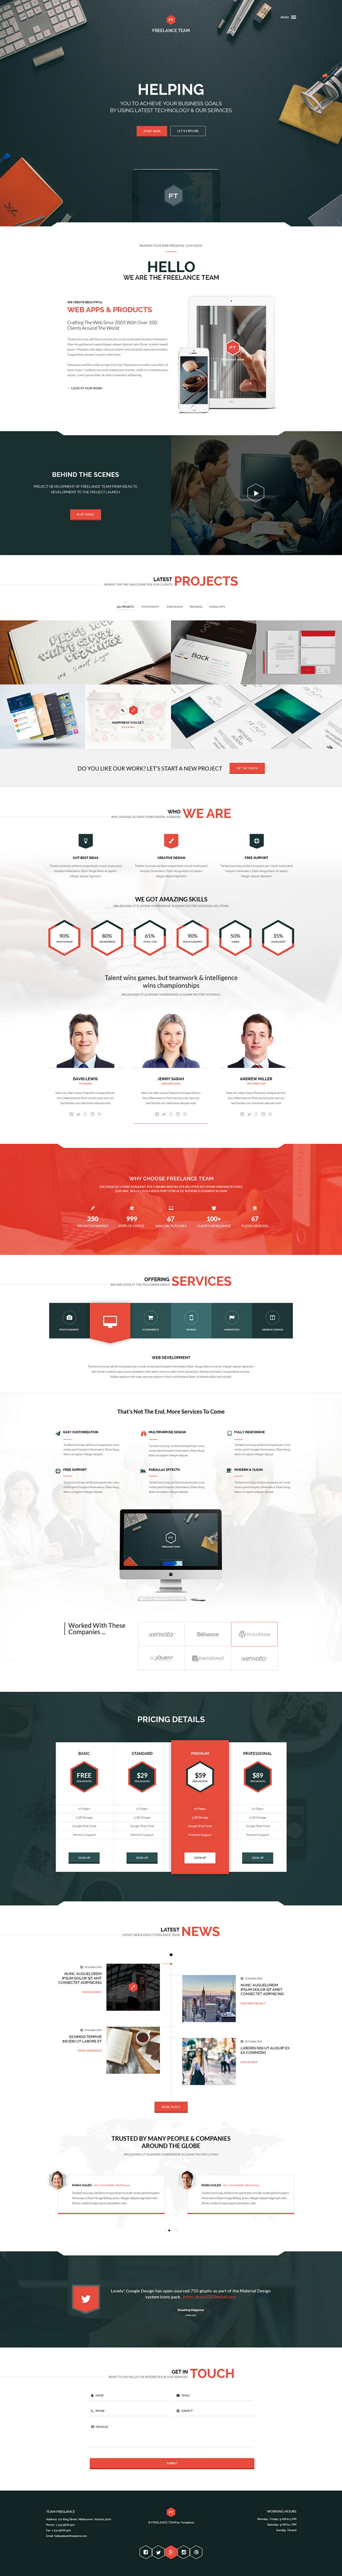 7 New Best Responsive Websites Themes (1st November 2014)